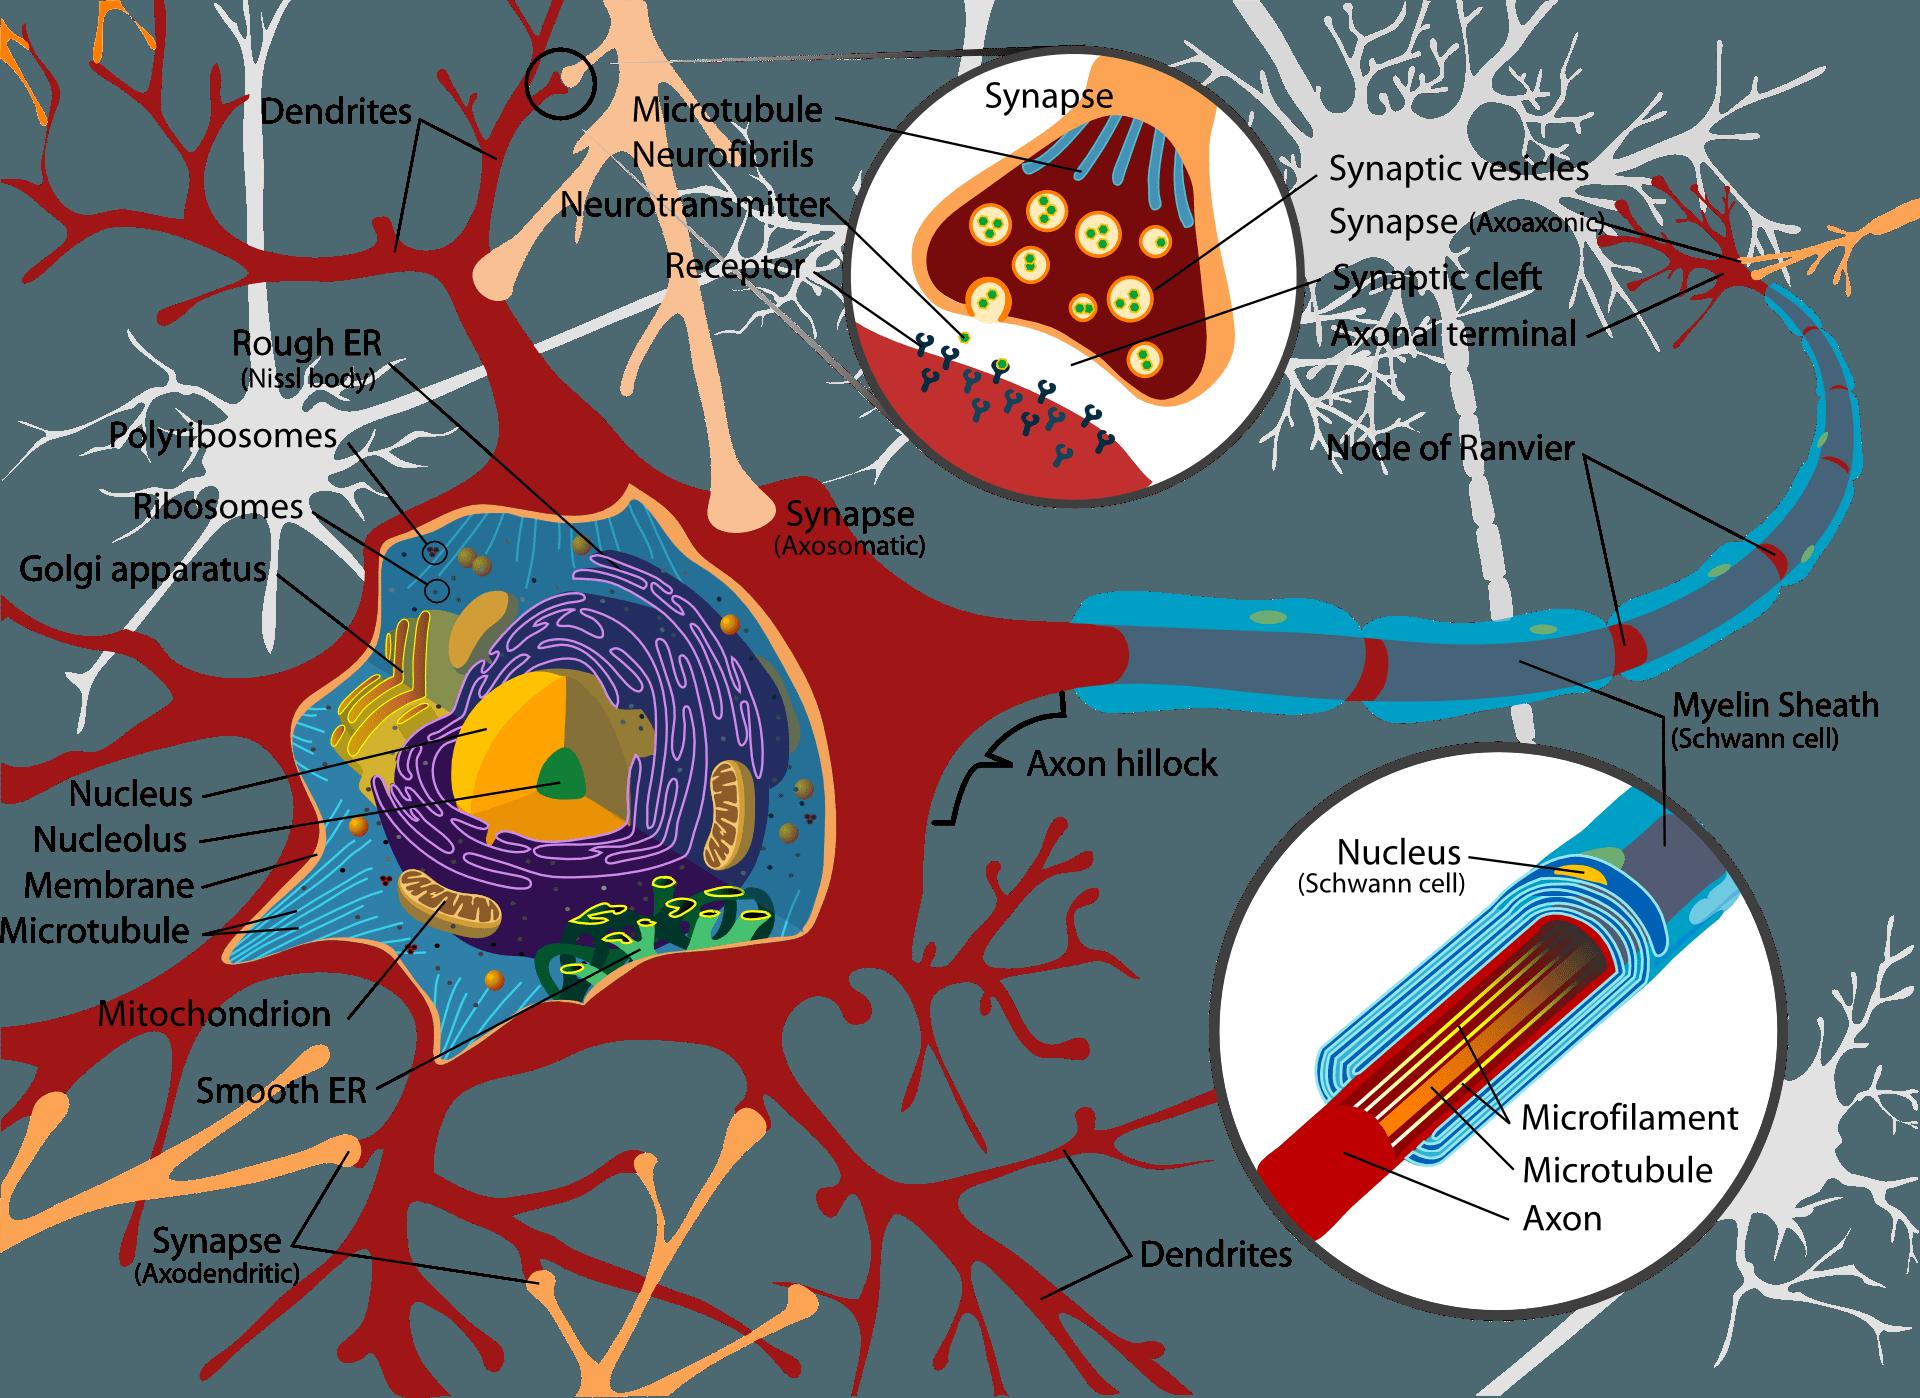 Nerve cell - neuron (presentation)